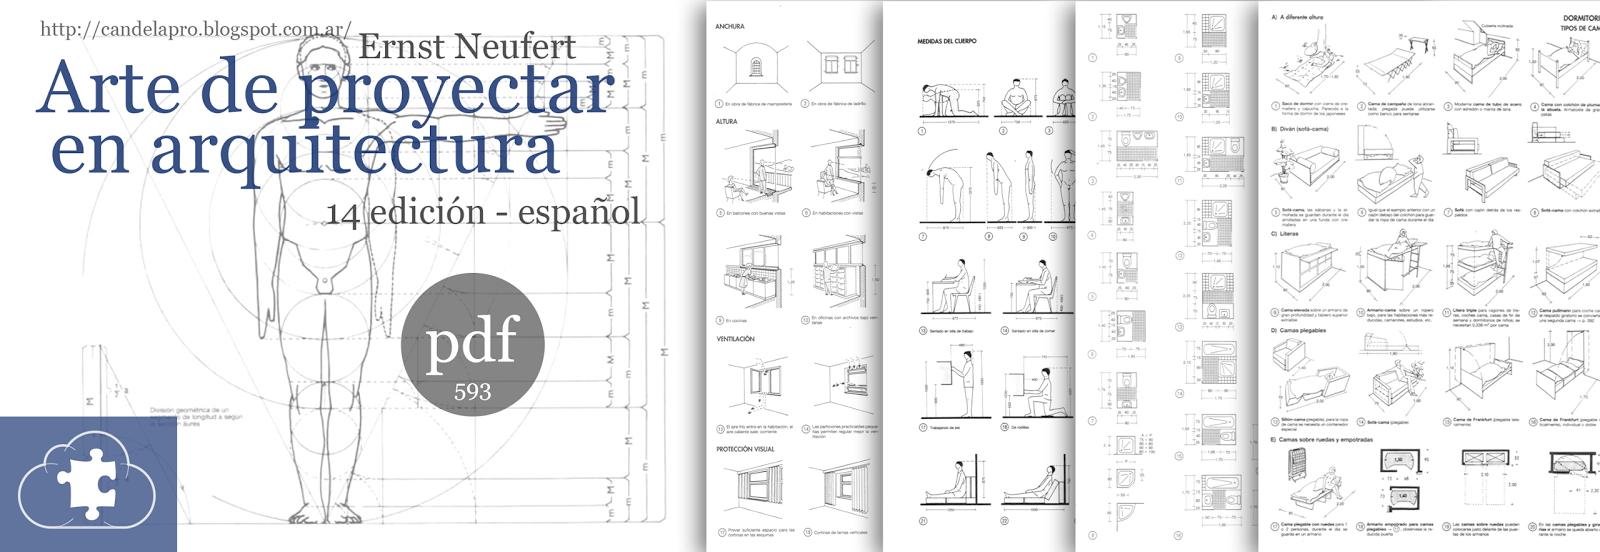 Neufert - Arte De Proyectar En Arquitectura - Español - 593 páginas [pdf]